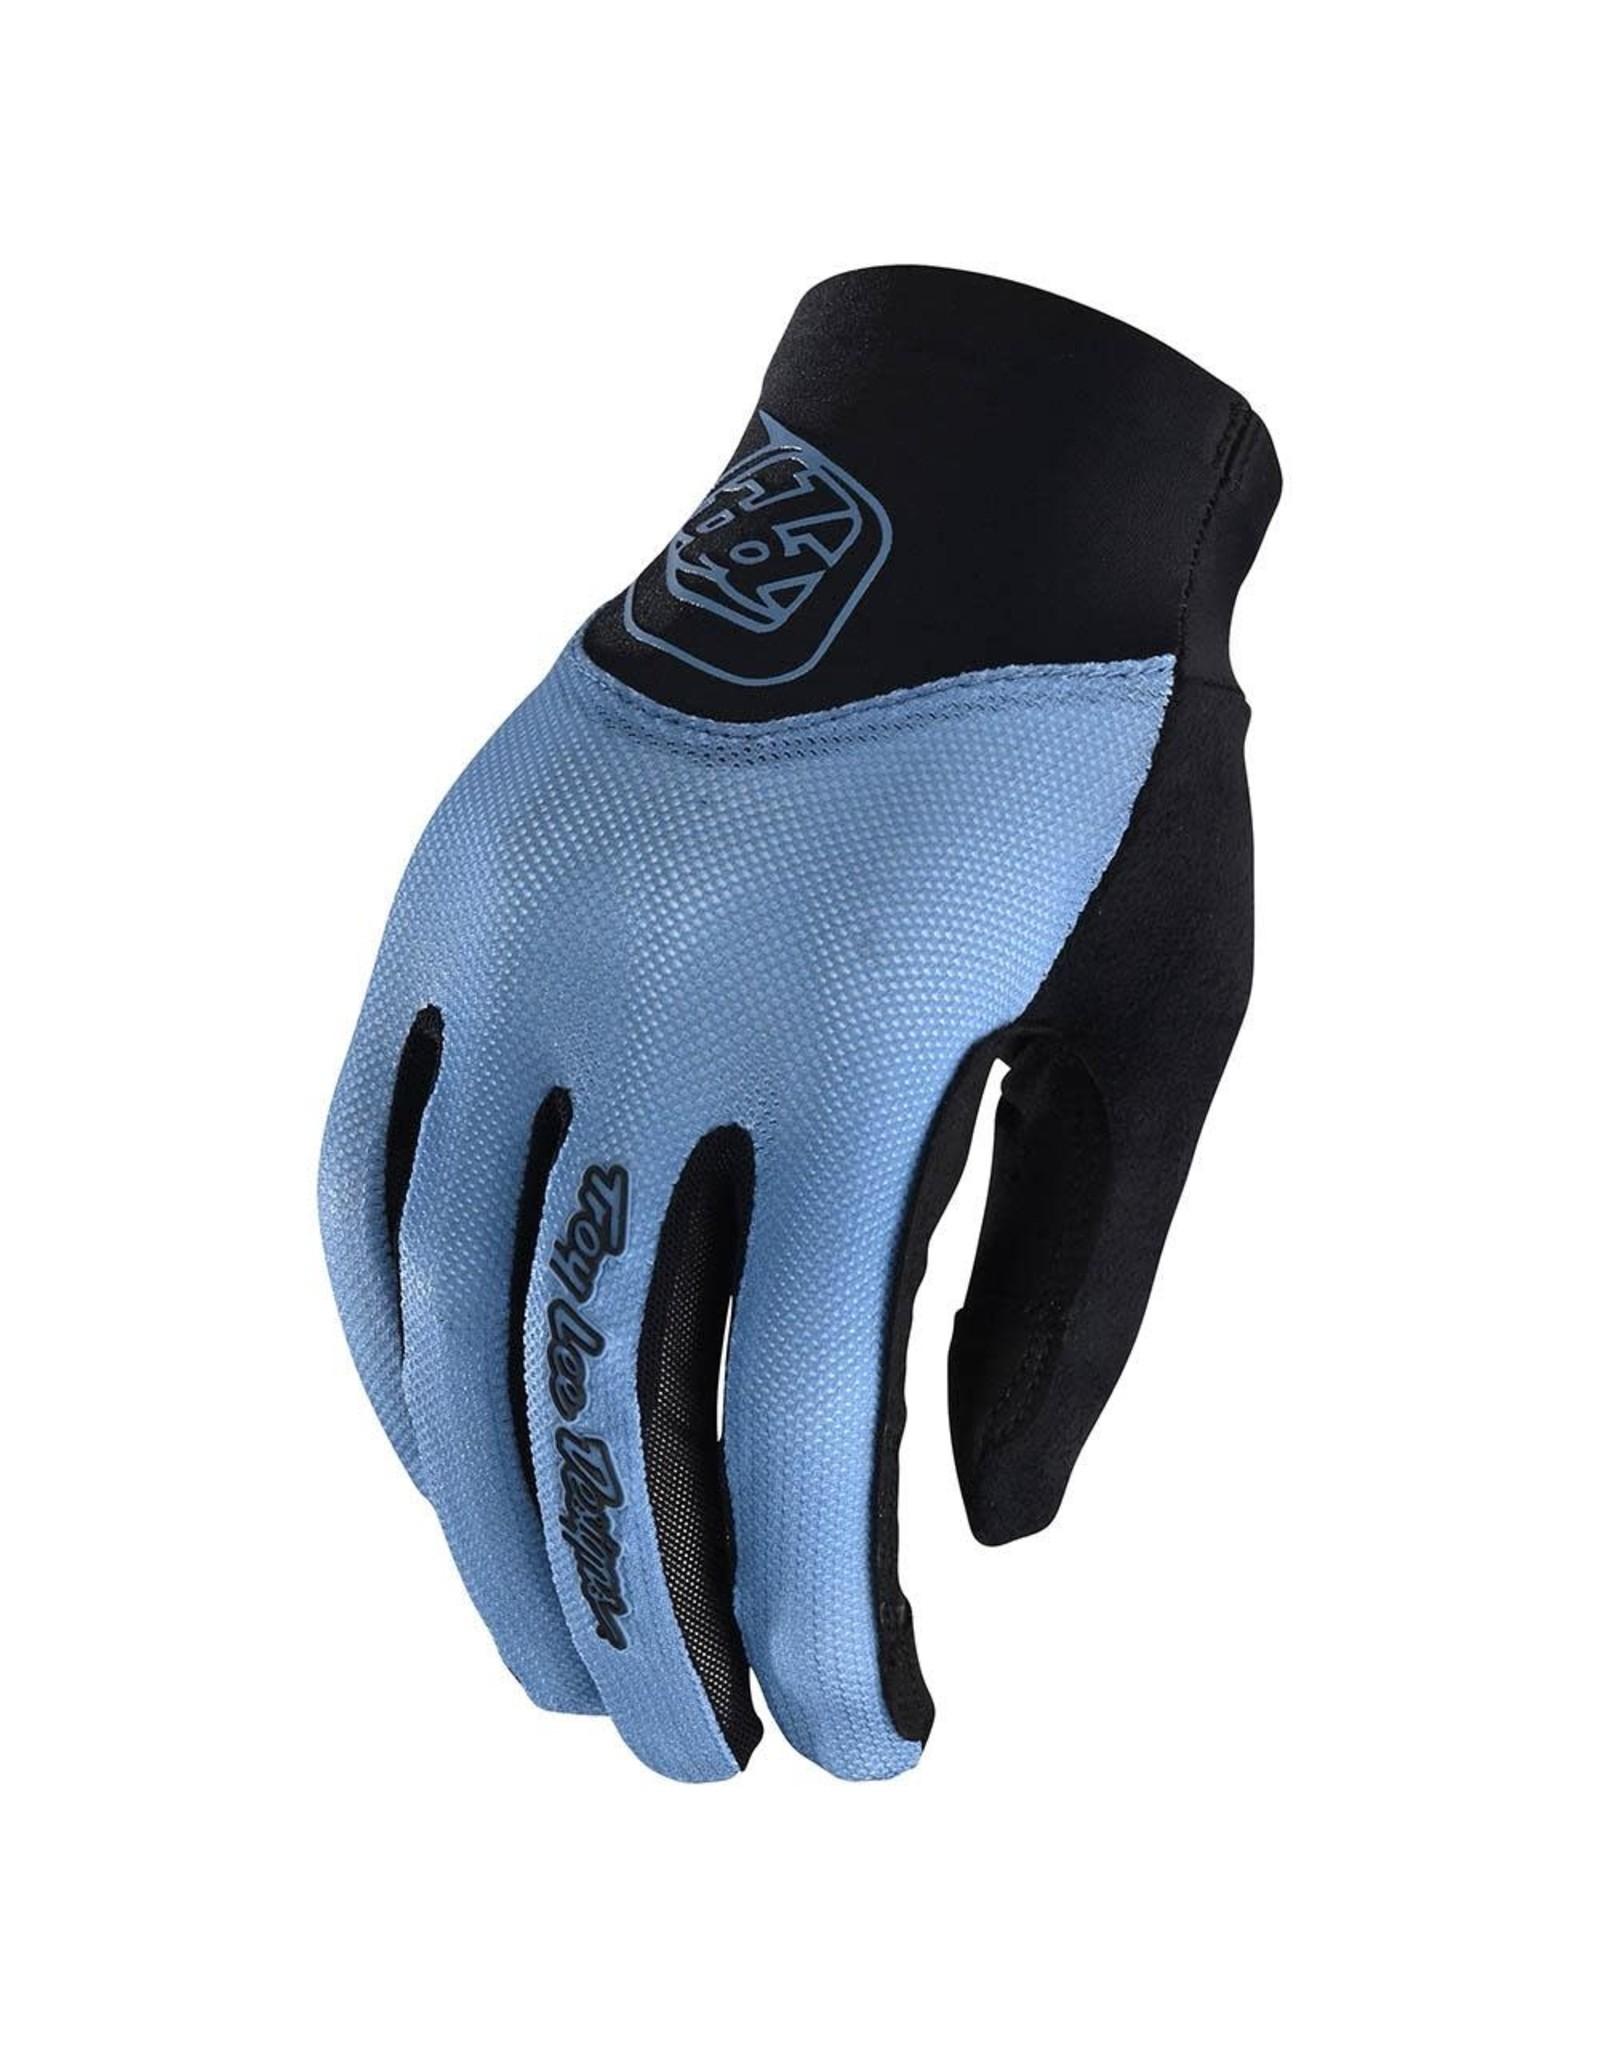 Troy Lee Designs Gloves Troy Lee Designs Ace Wmn's